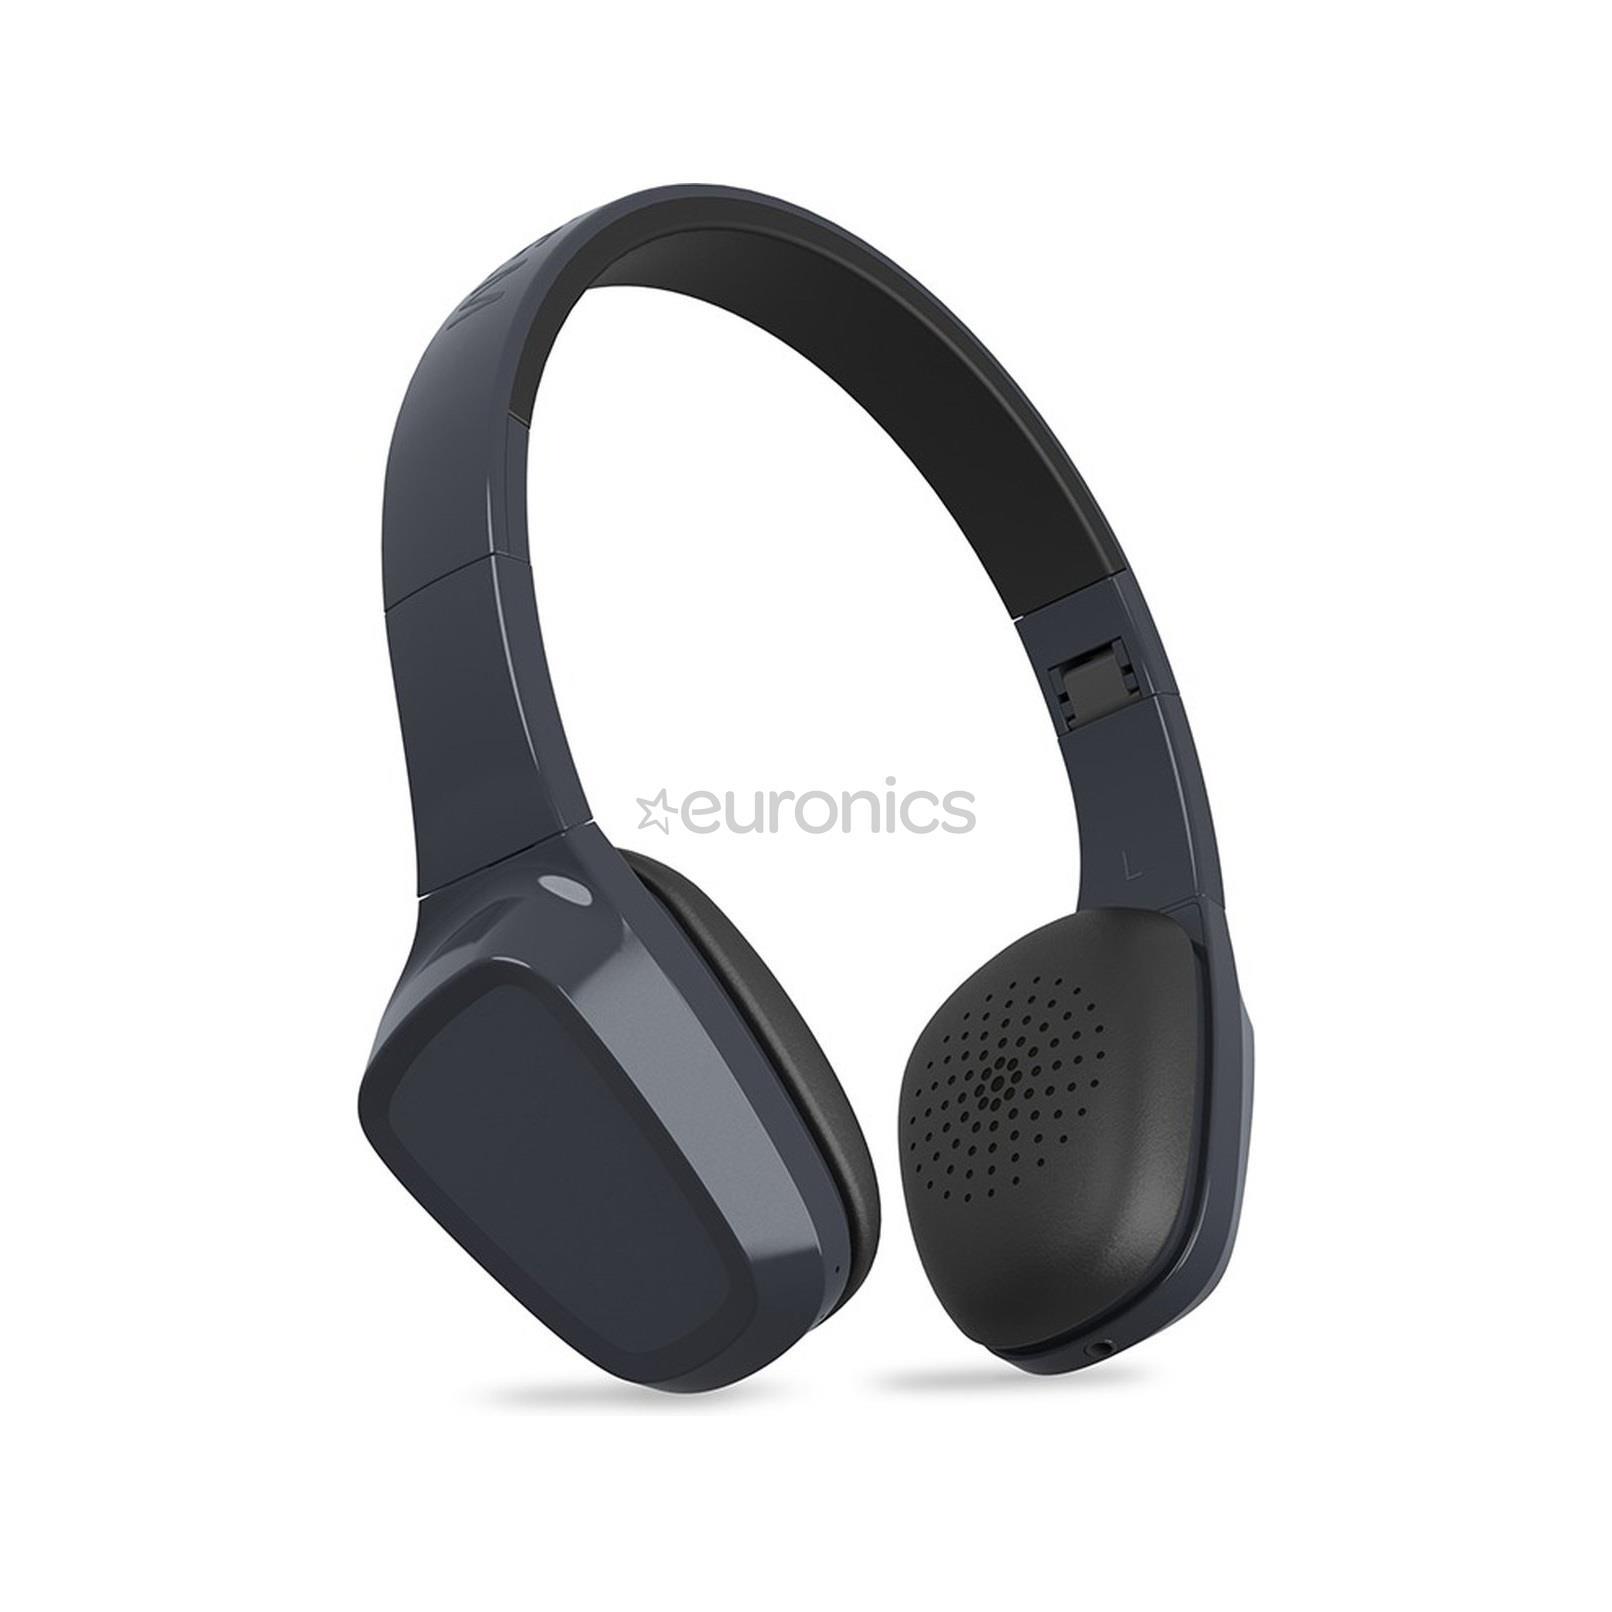 0c2a9c1e674 Wireless Headphones 1, EnergySistem, 428182